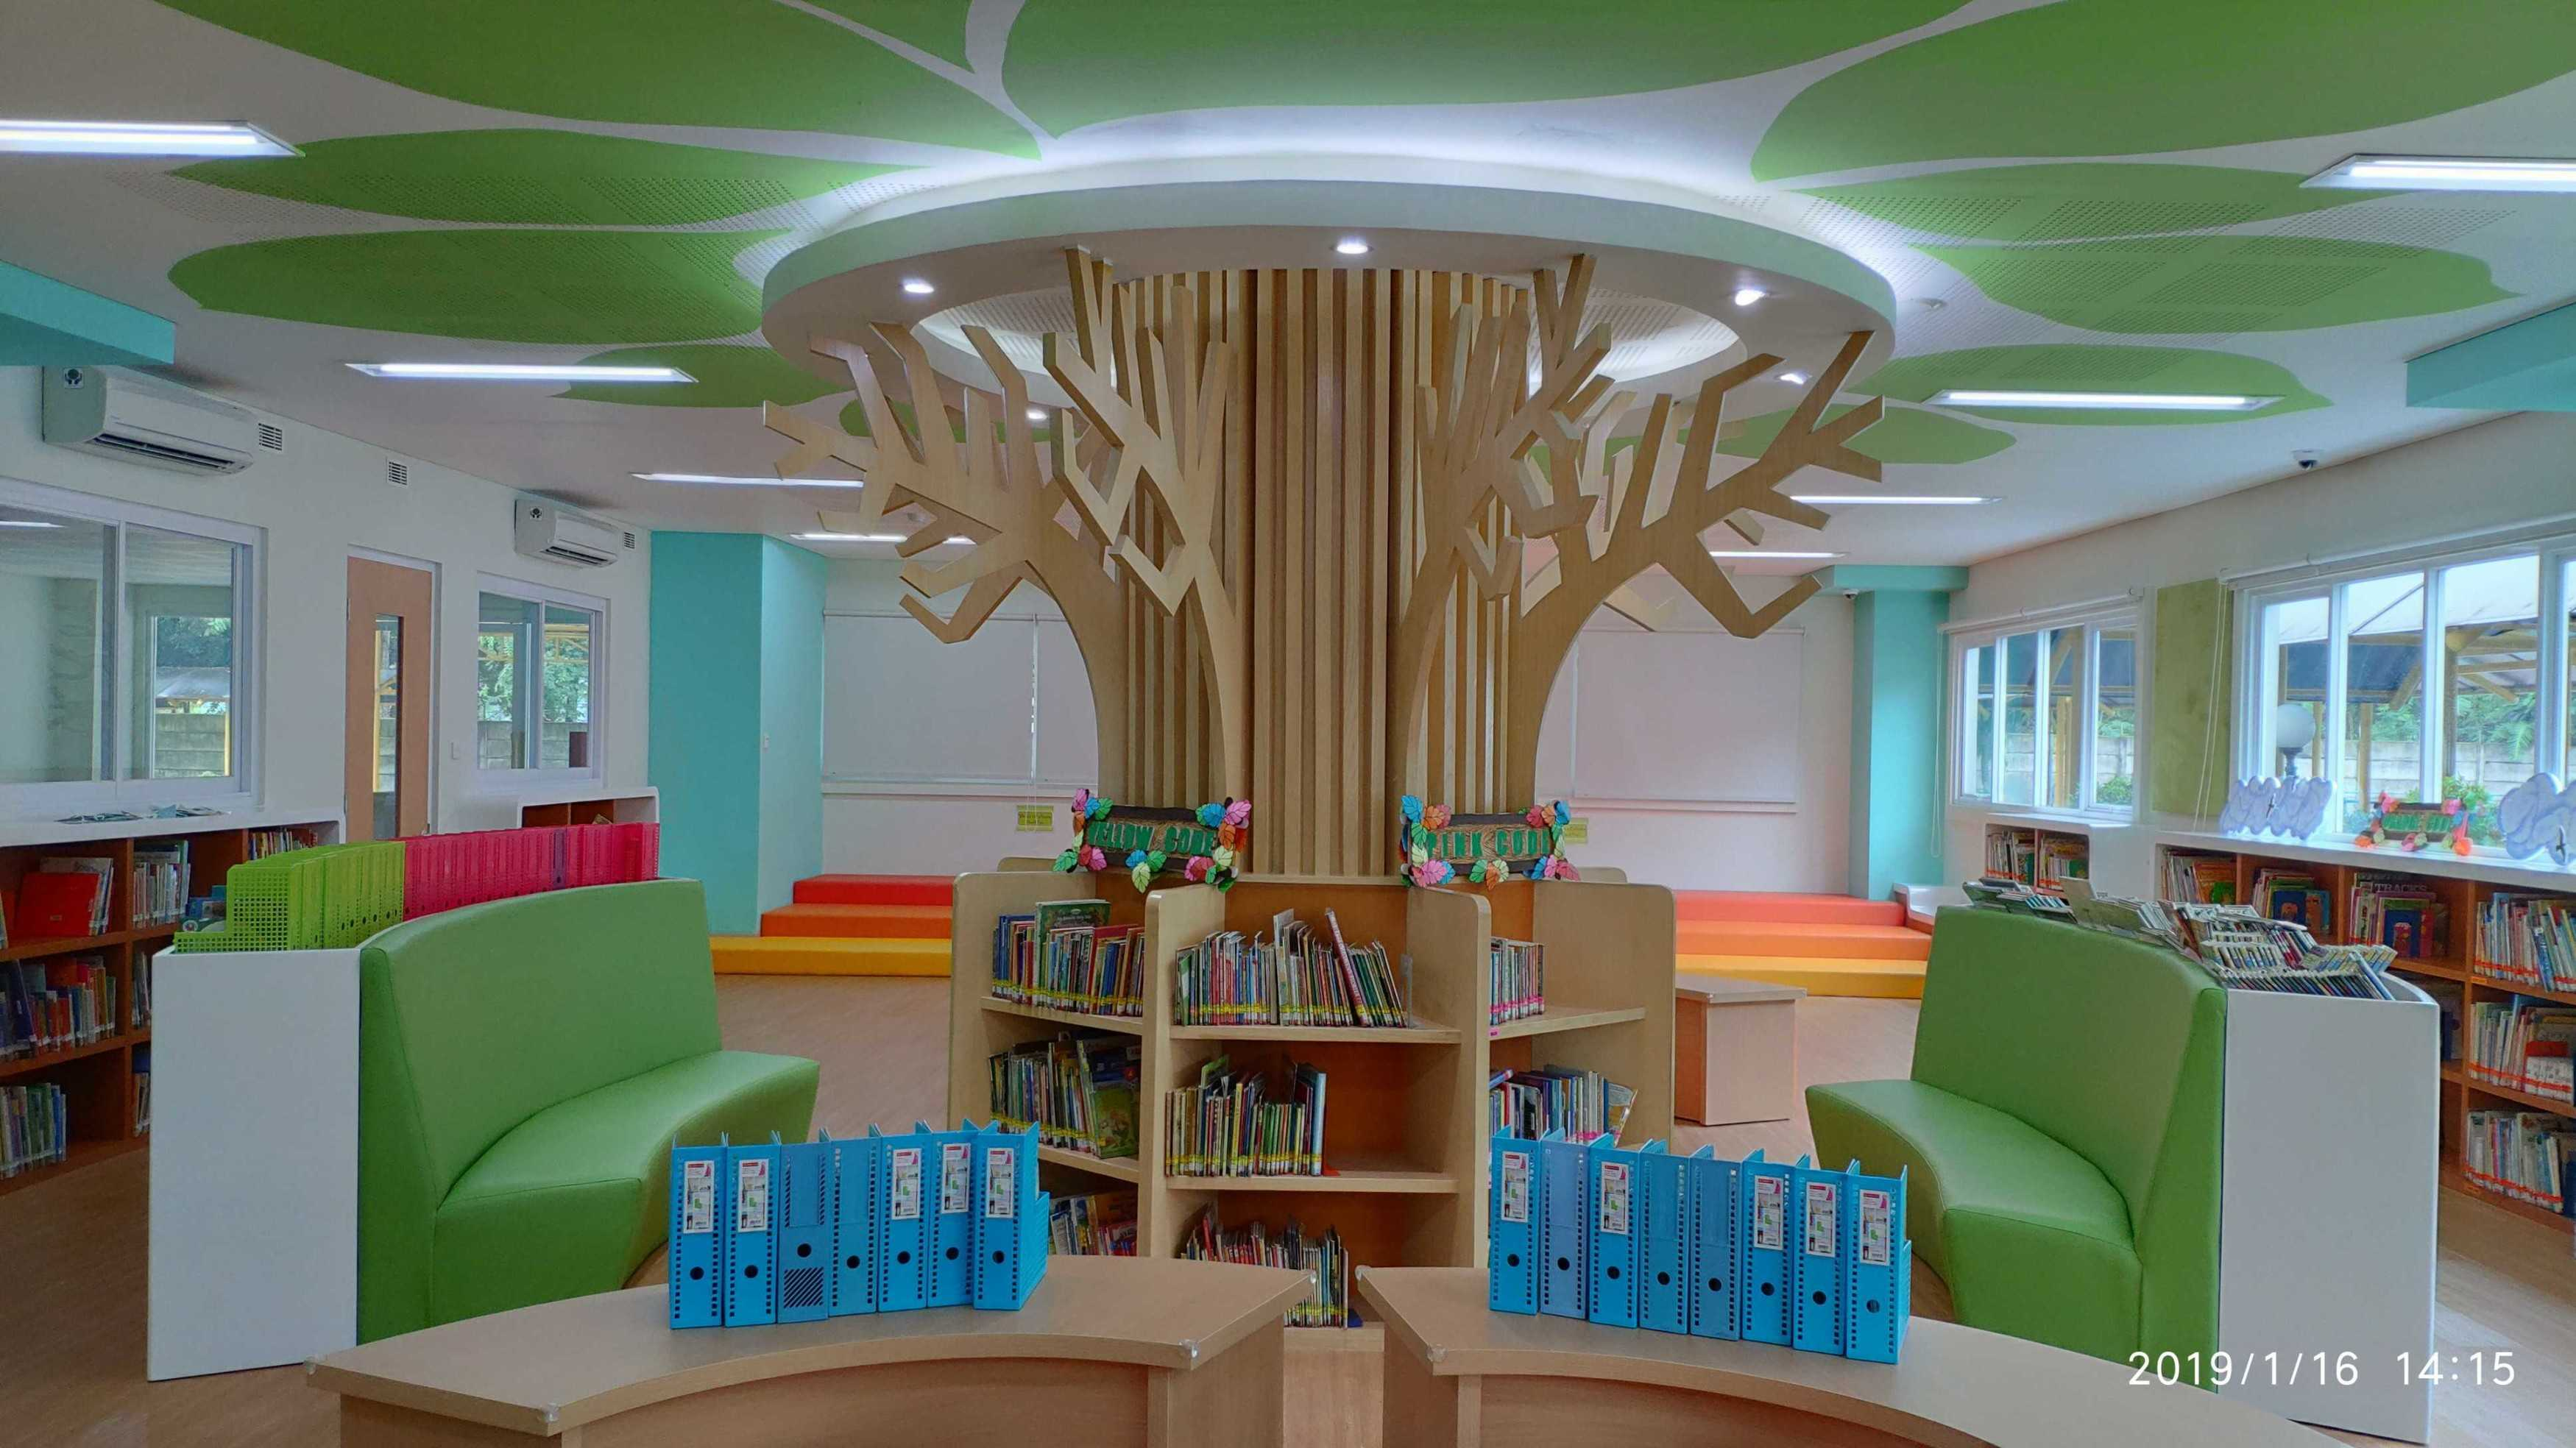 Yos Villys - Serafindo Perpustakaan Sekolah Bogor, Jawa Barat, Indonesia Bogor, Jawa Barat, Indonesia Yos-Perpustakaan-Sekolah   119787